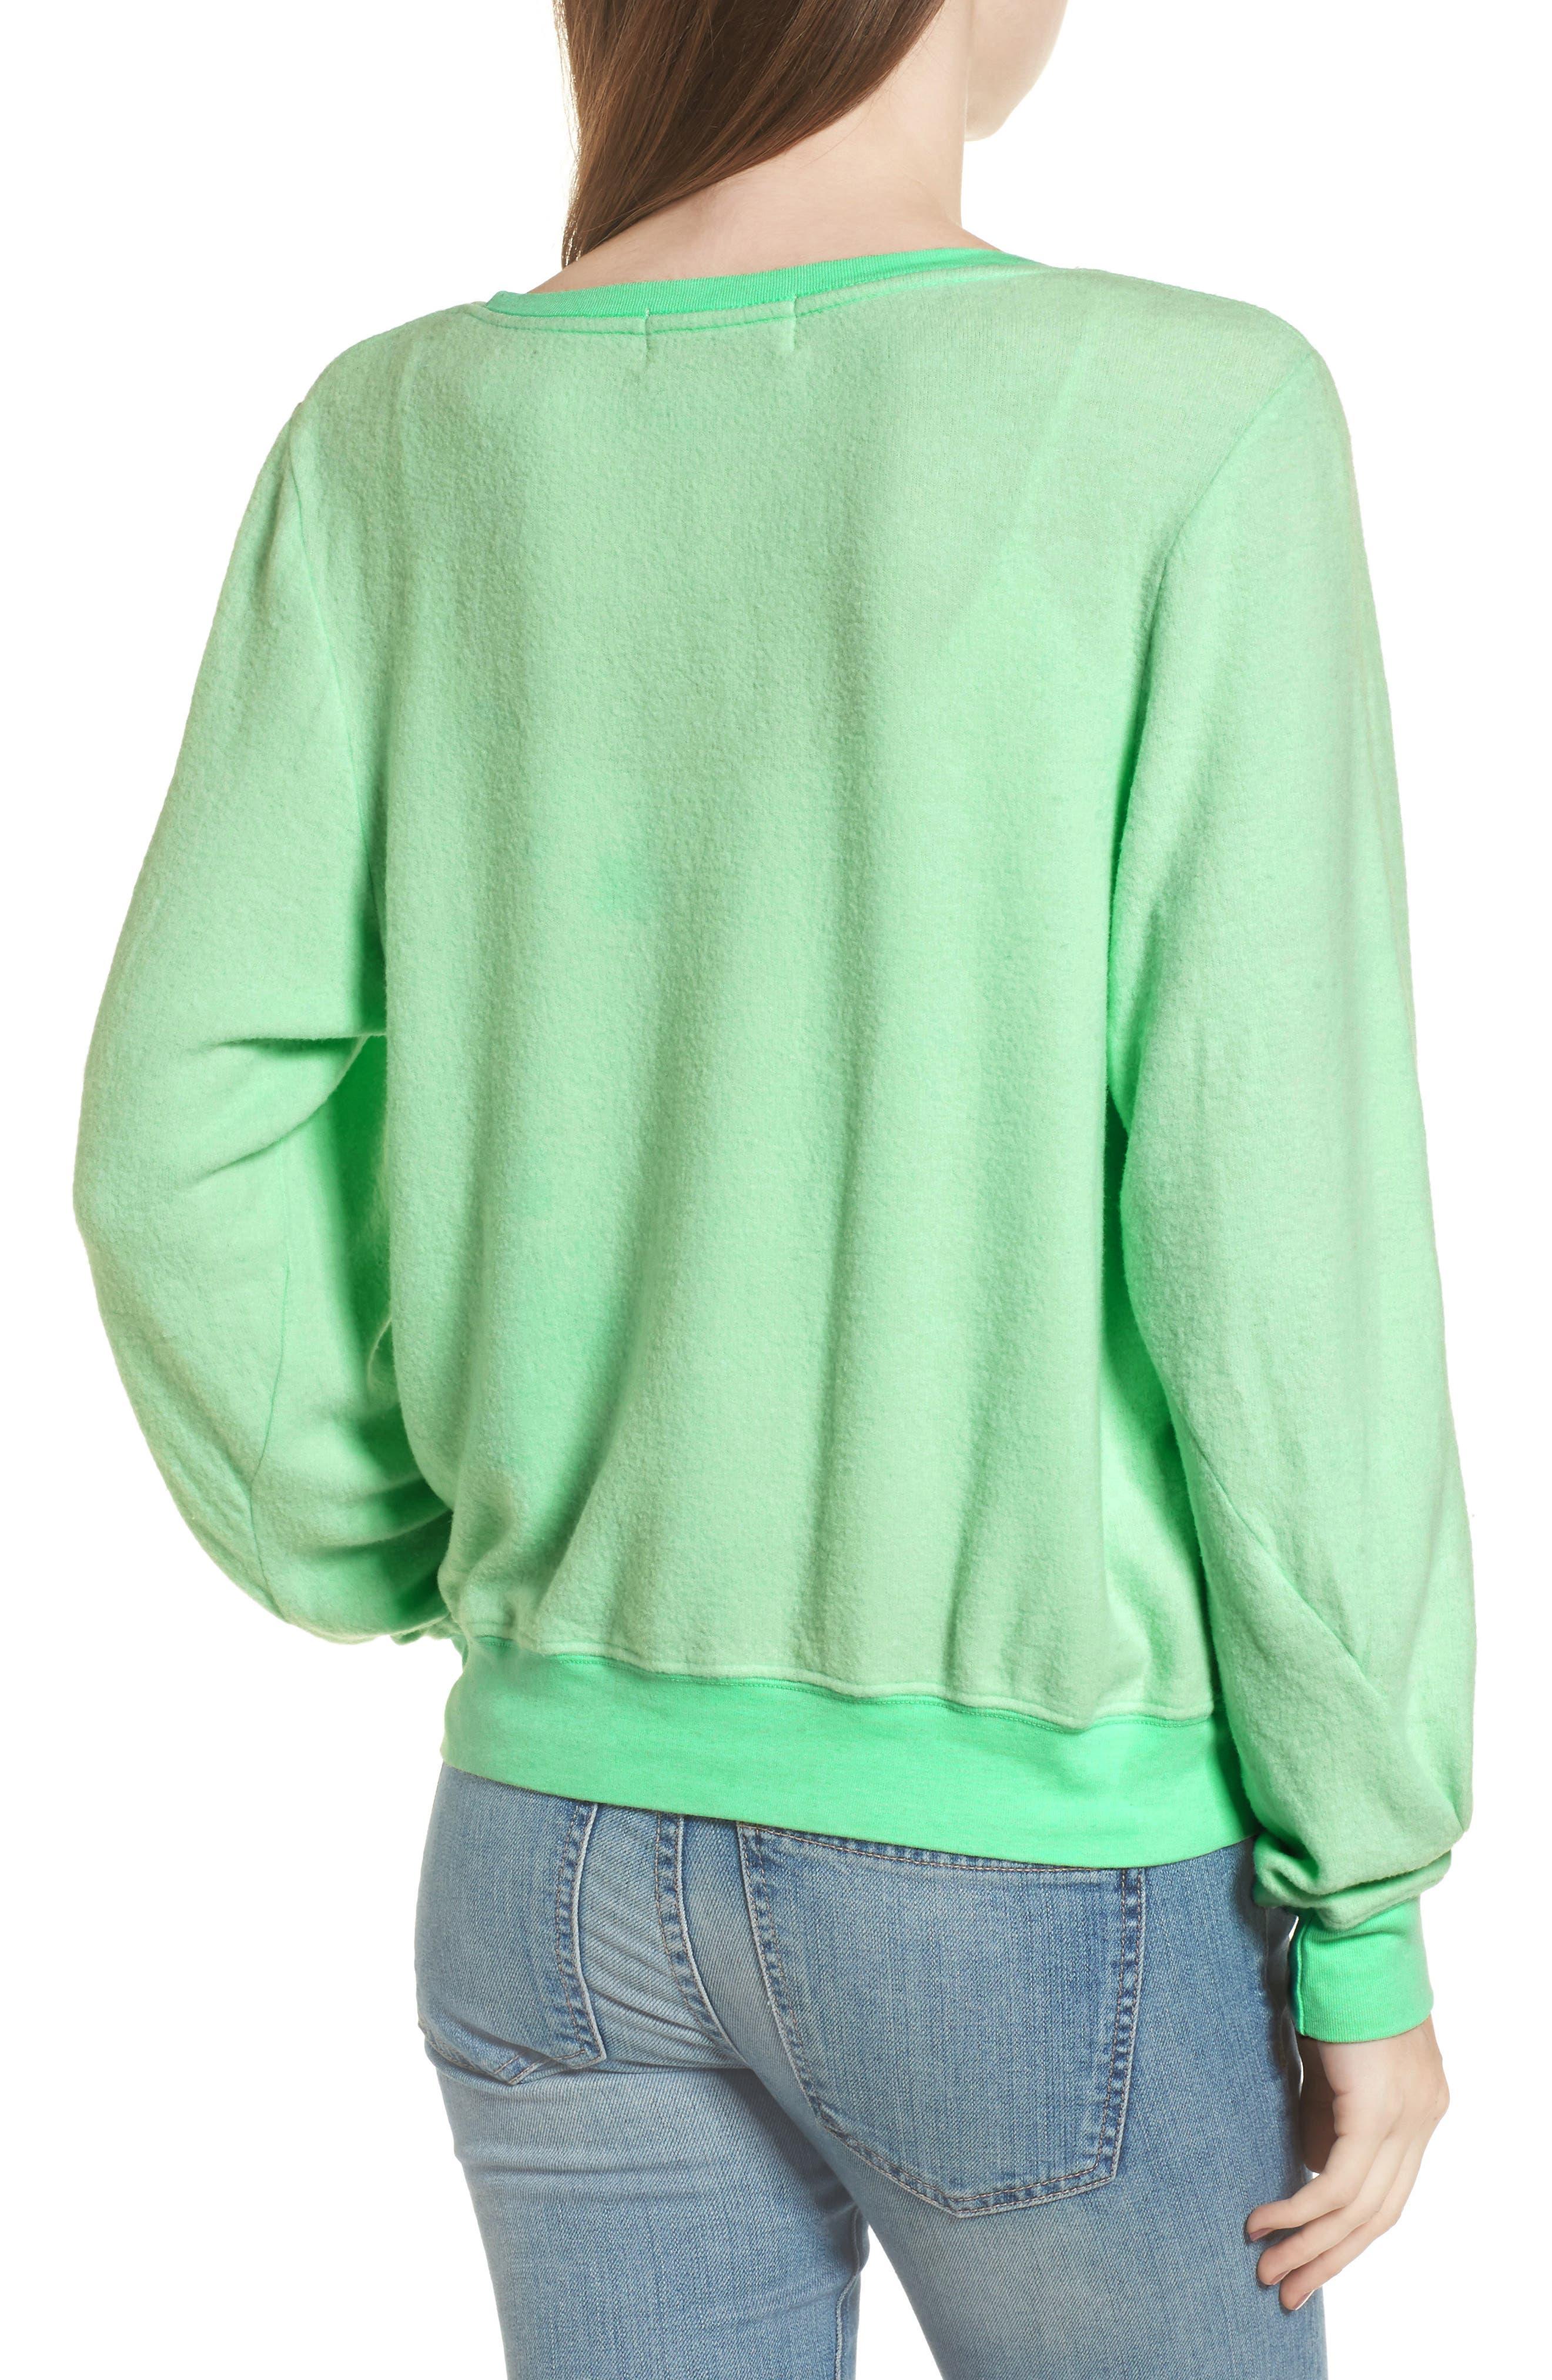 California Dreamin Sweatshirt,                             Alternate thumbnail 2, color,                             320